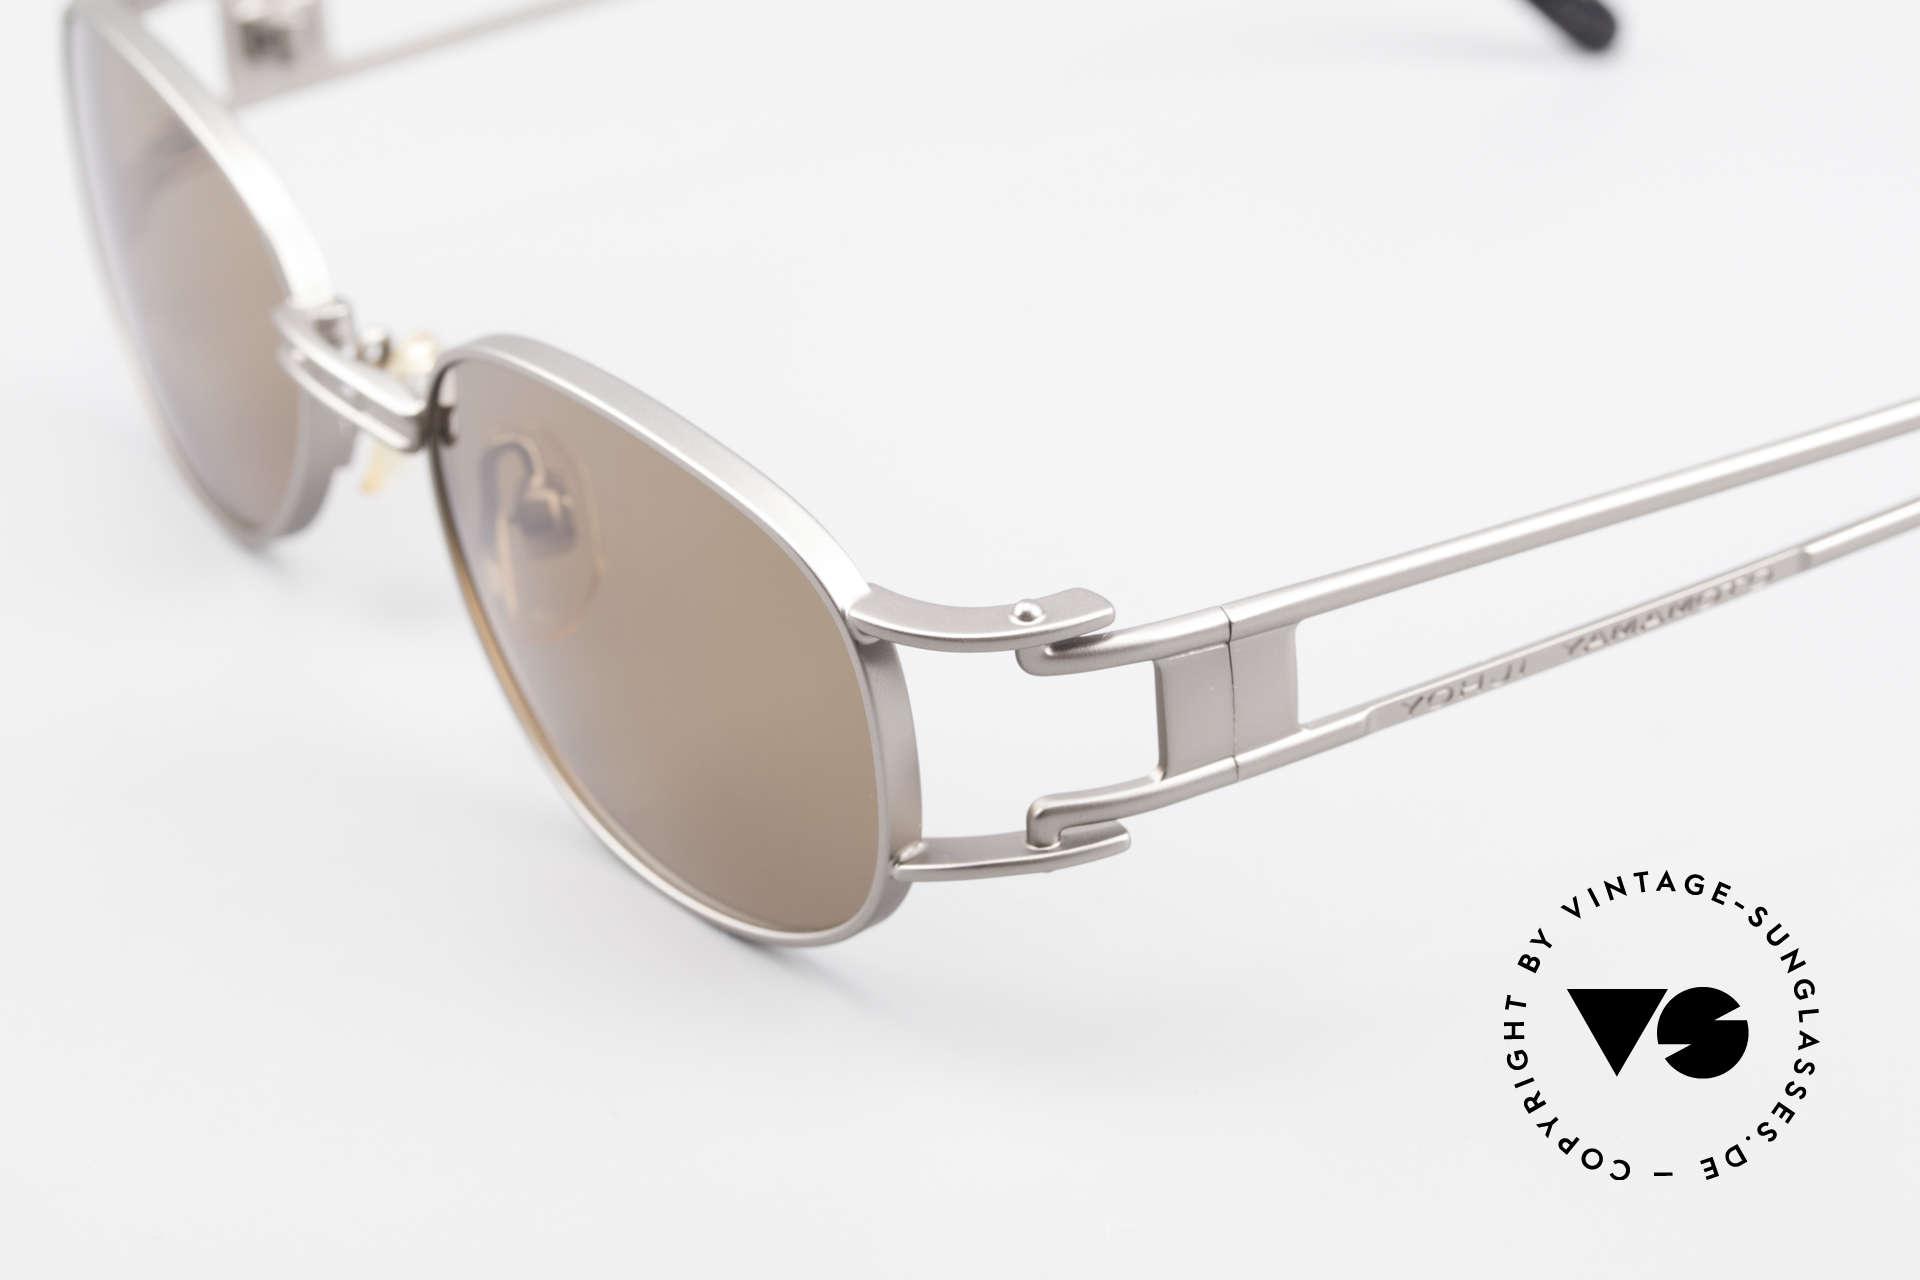 Yohji Yamamoto 52-6106 Designer Shades Vintage Oval, unworn (like all our rare vintage YY designer sunglasses), Made for Men and Women